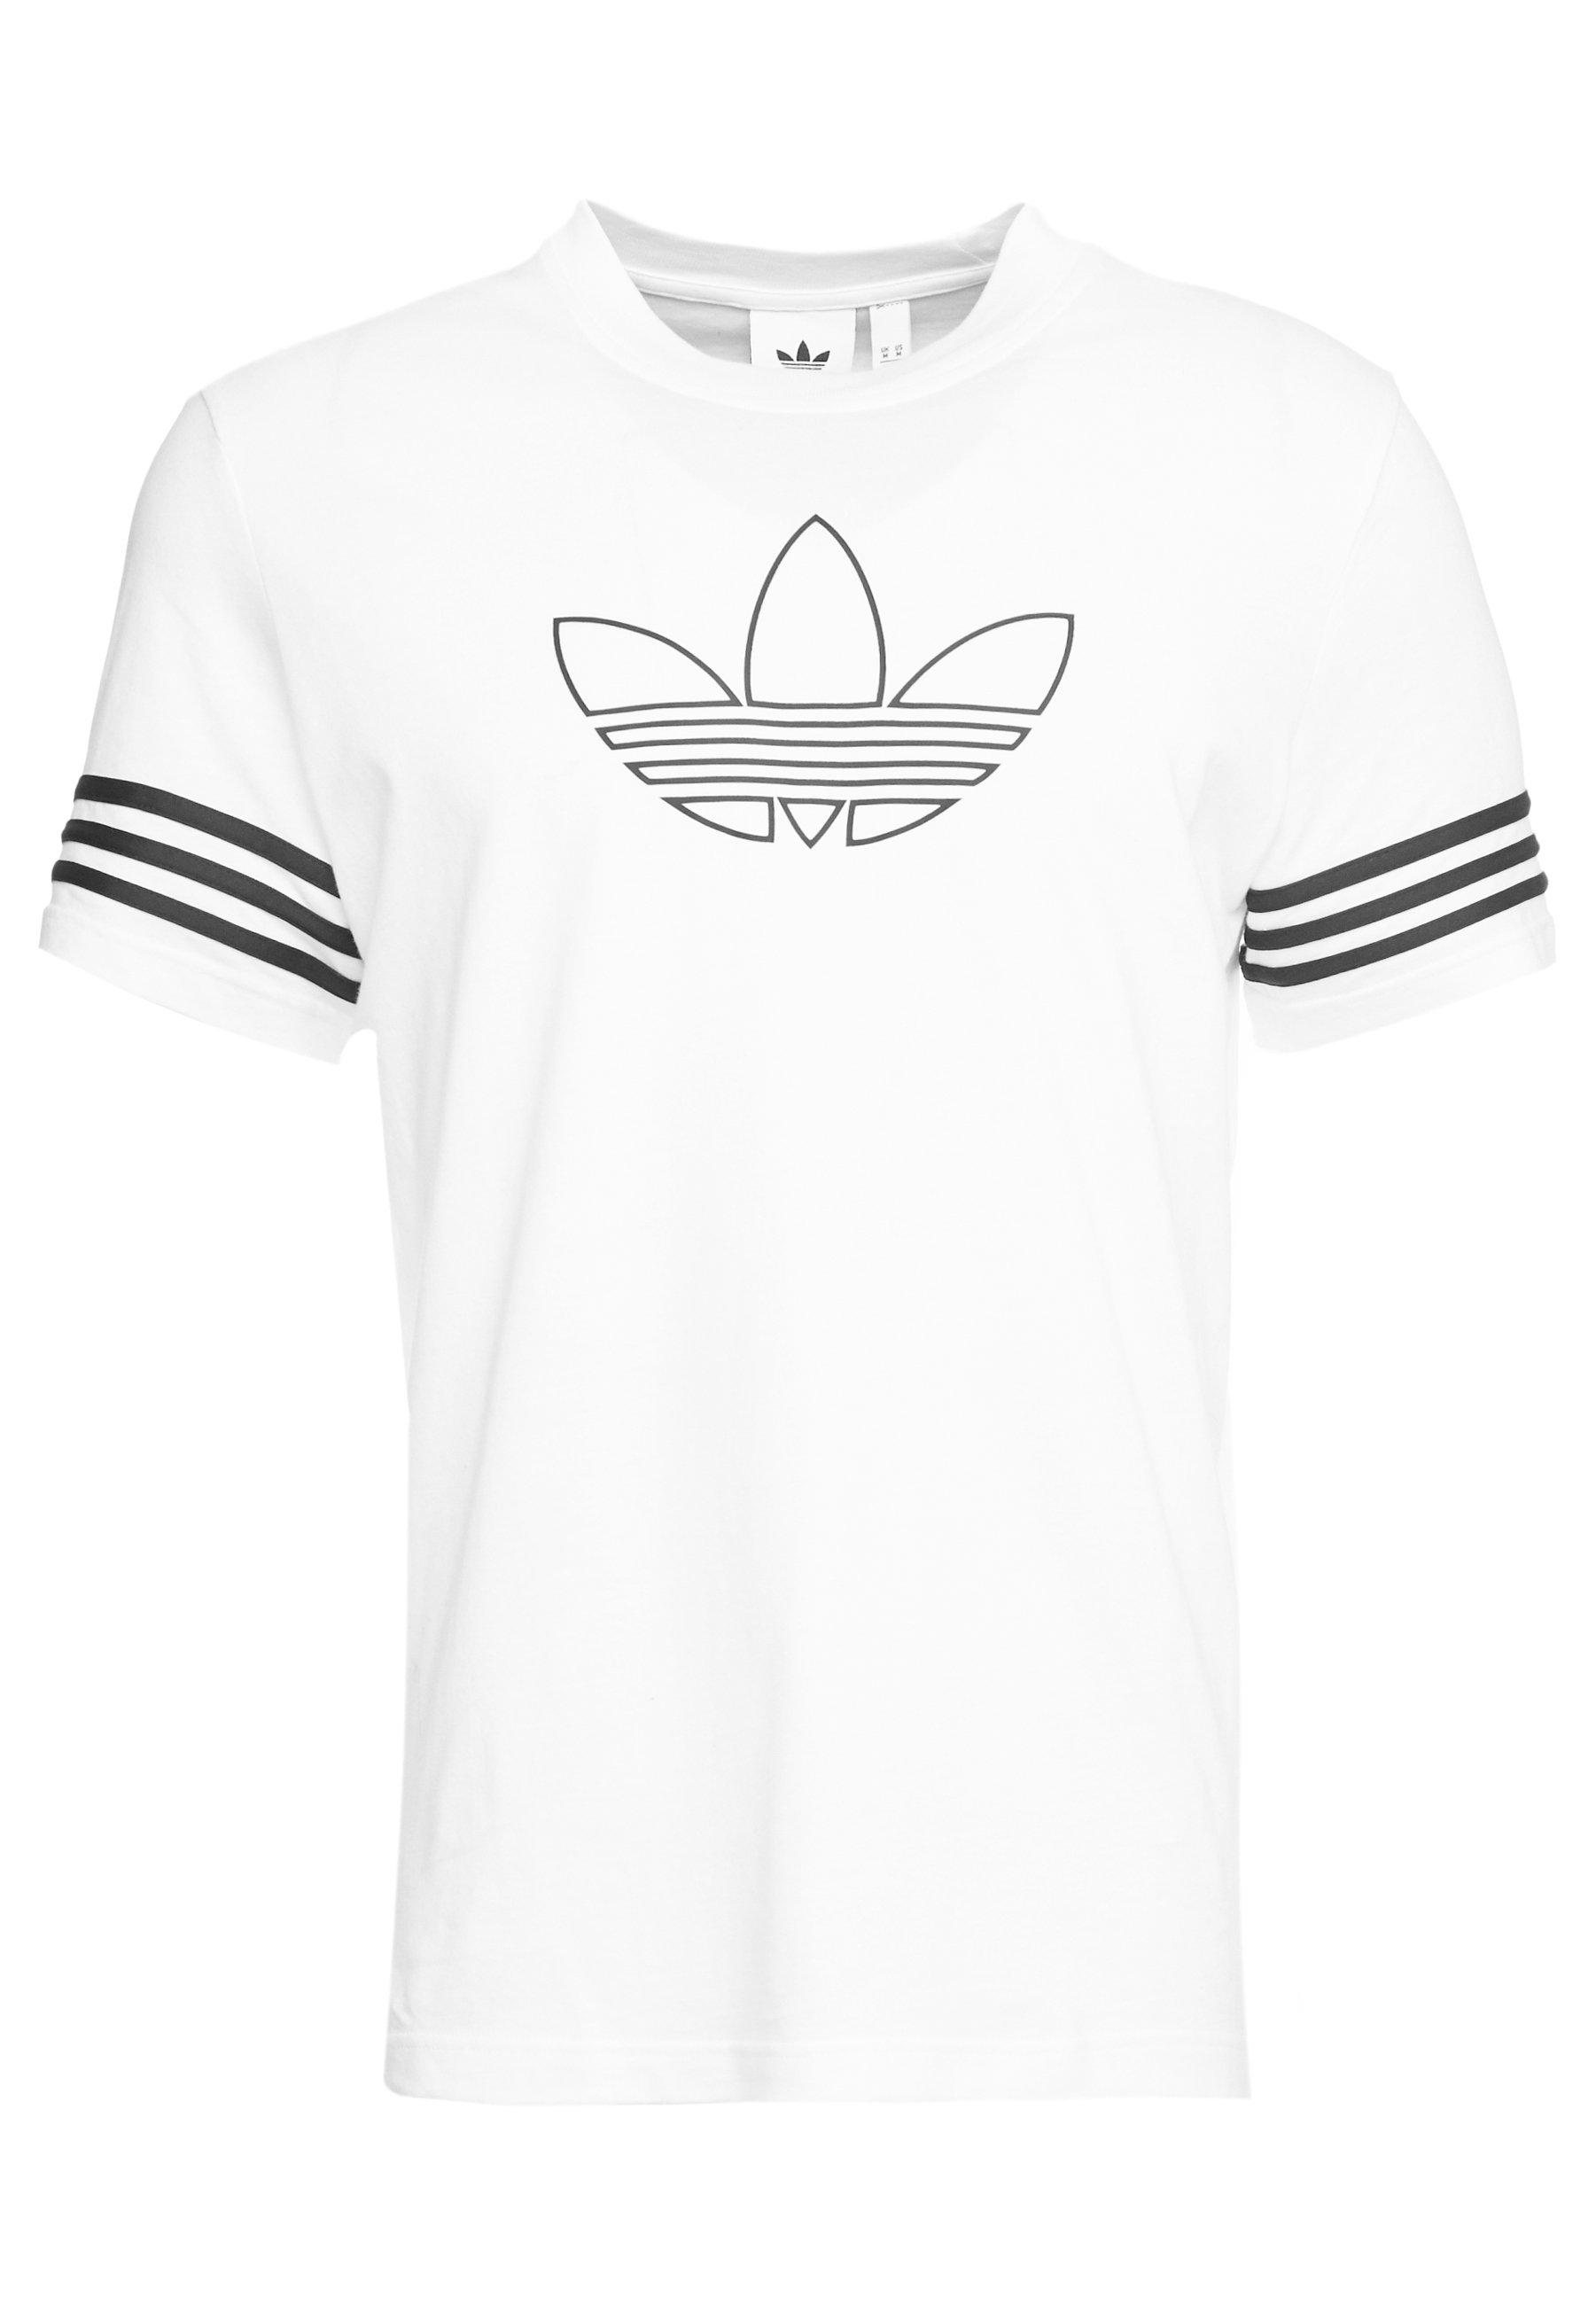 Adidas Originals Outline Tee - T-shirts Med Print White